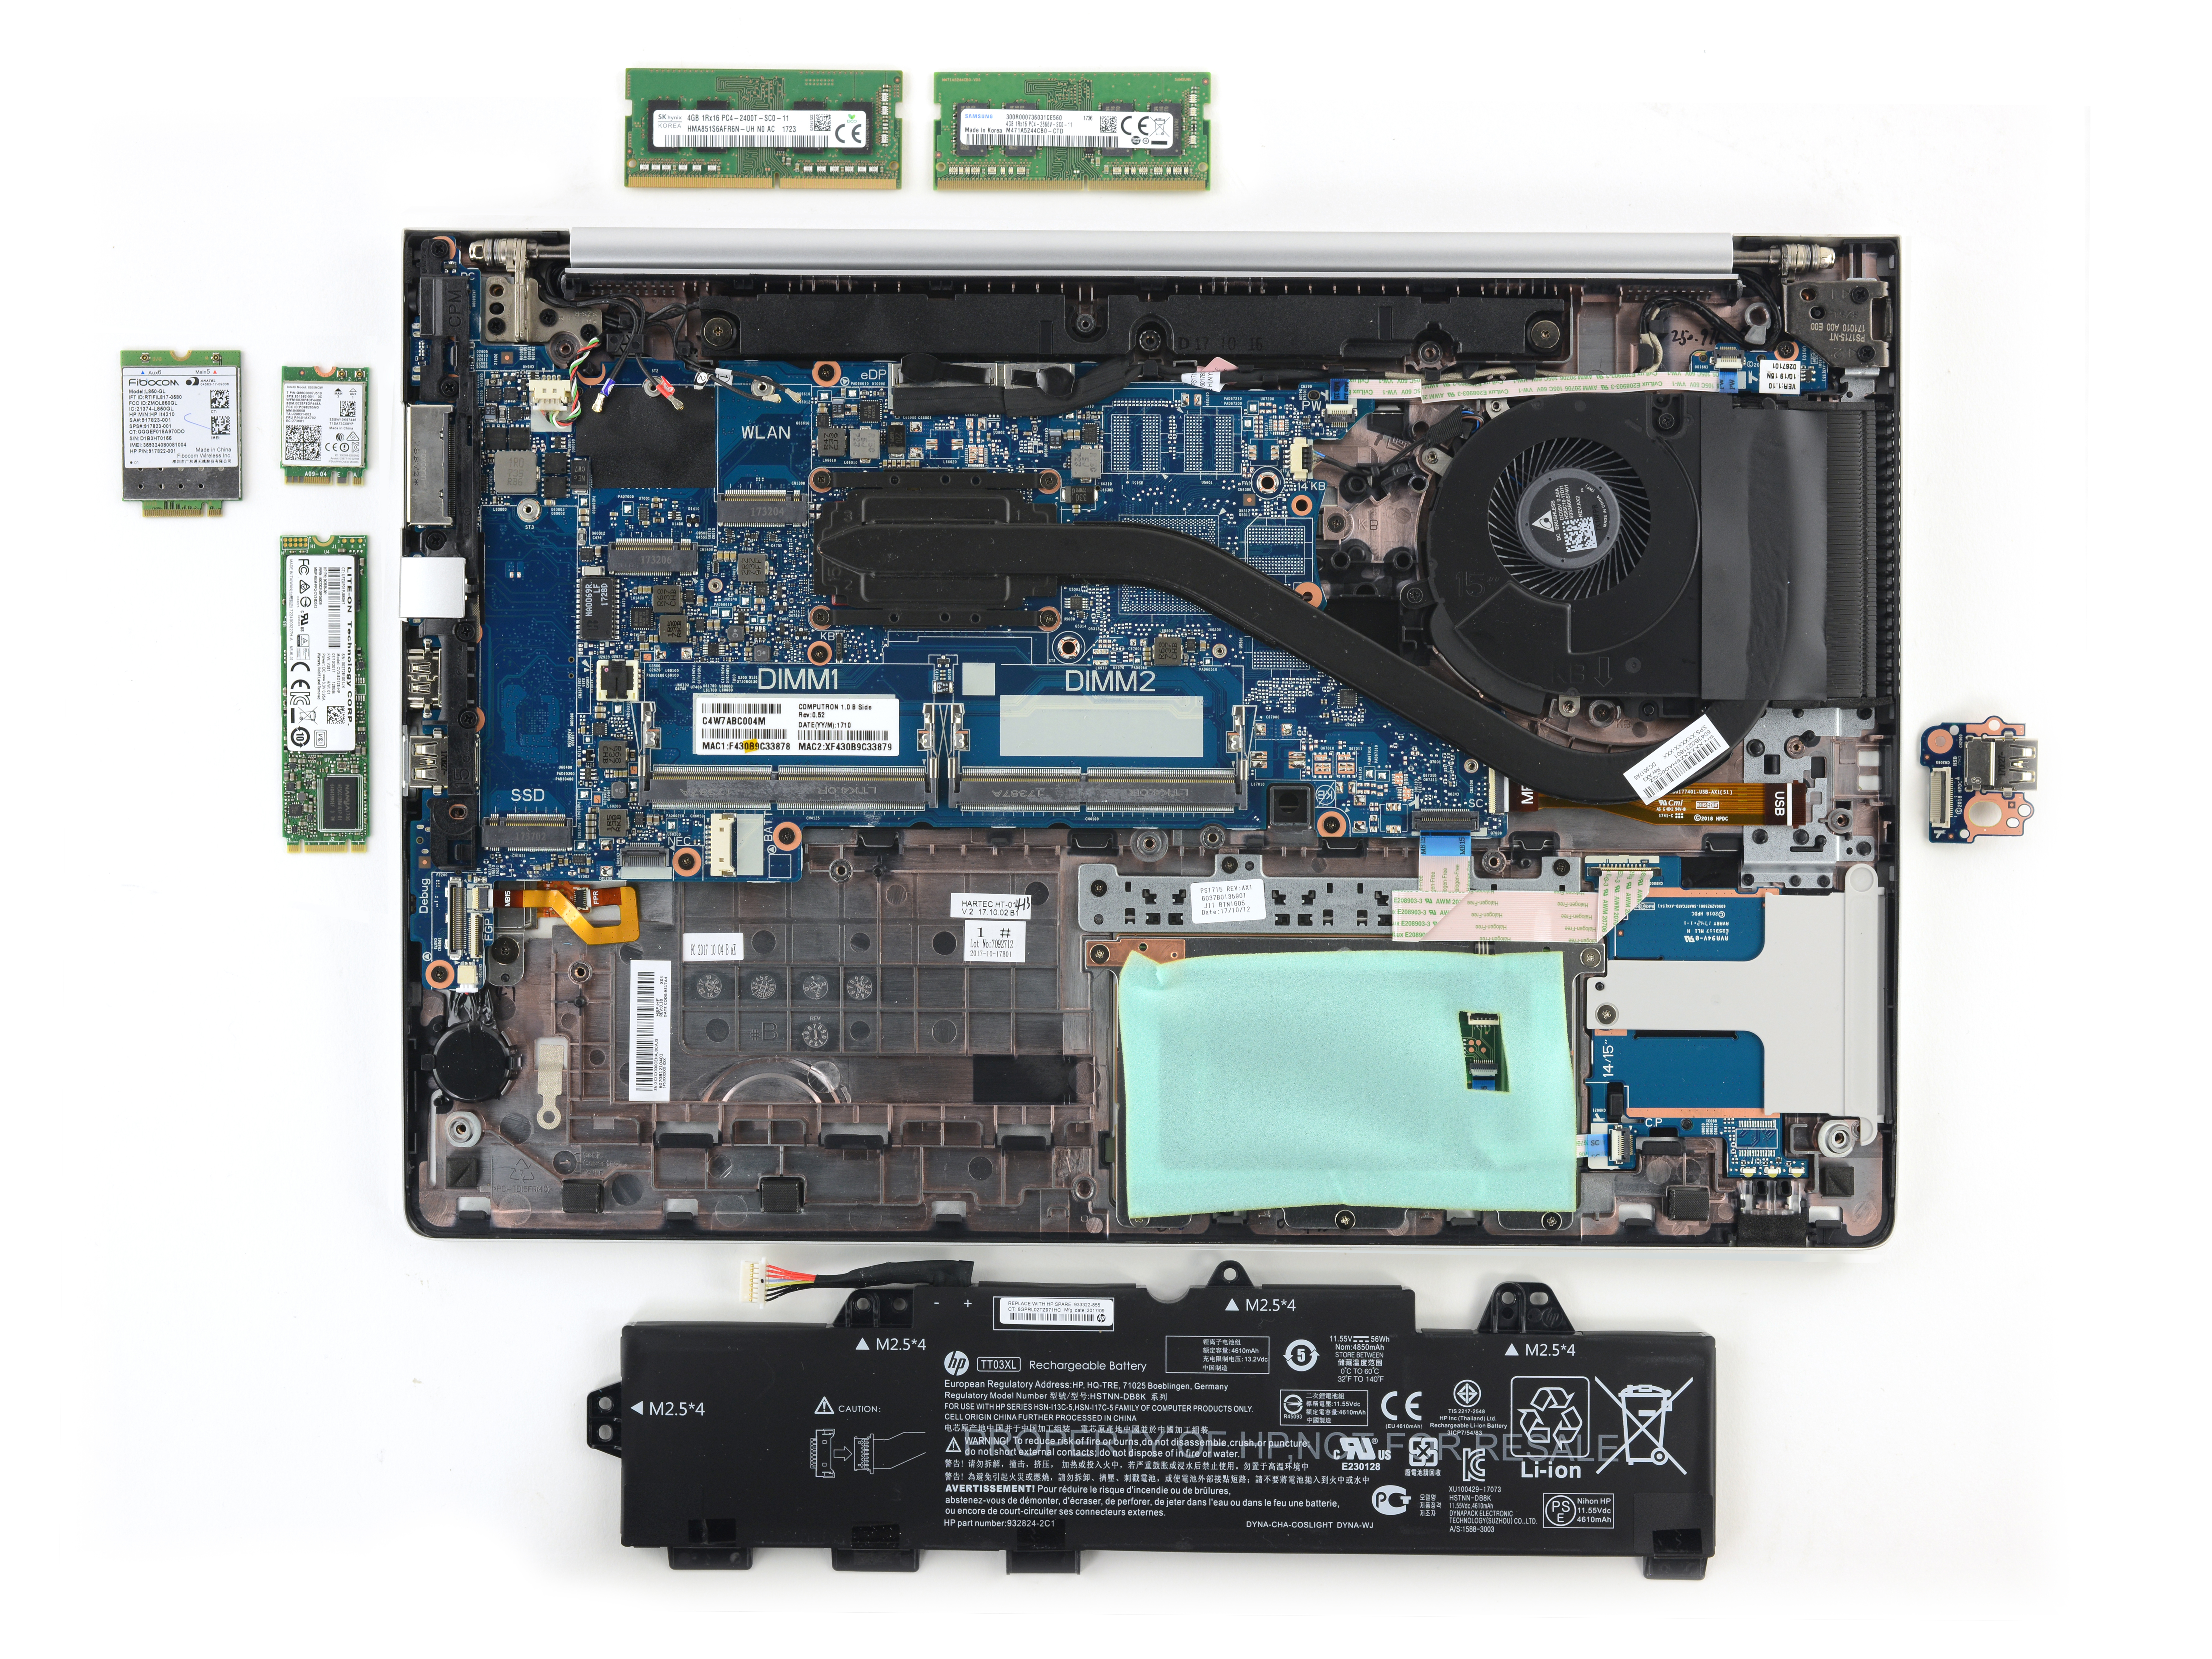 Modularity of the EliteBook 800 G5.